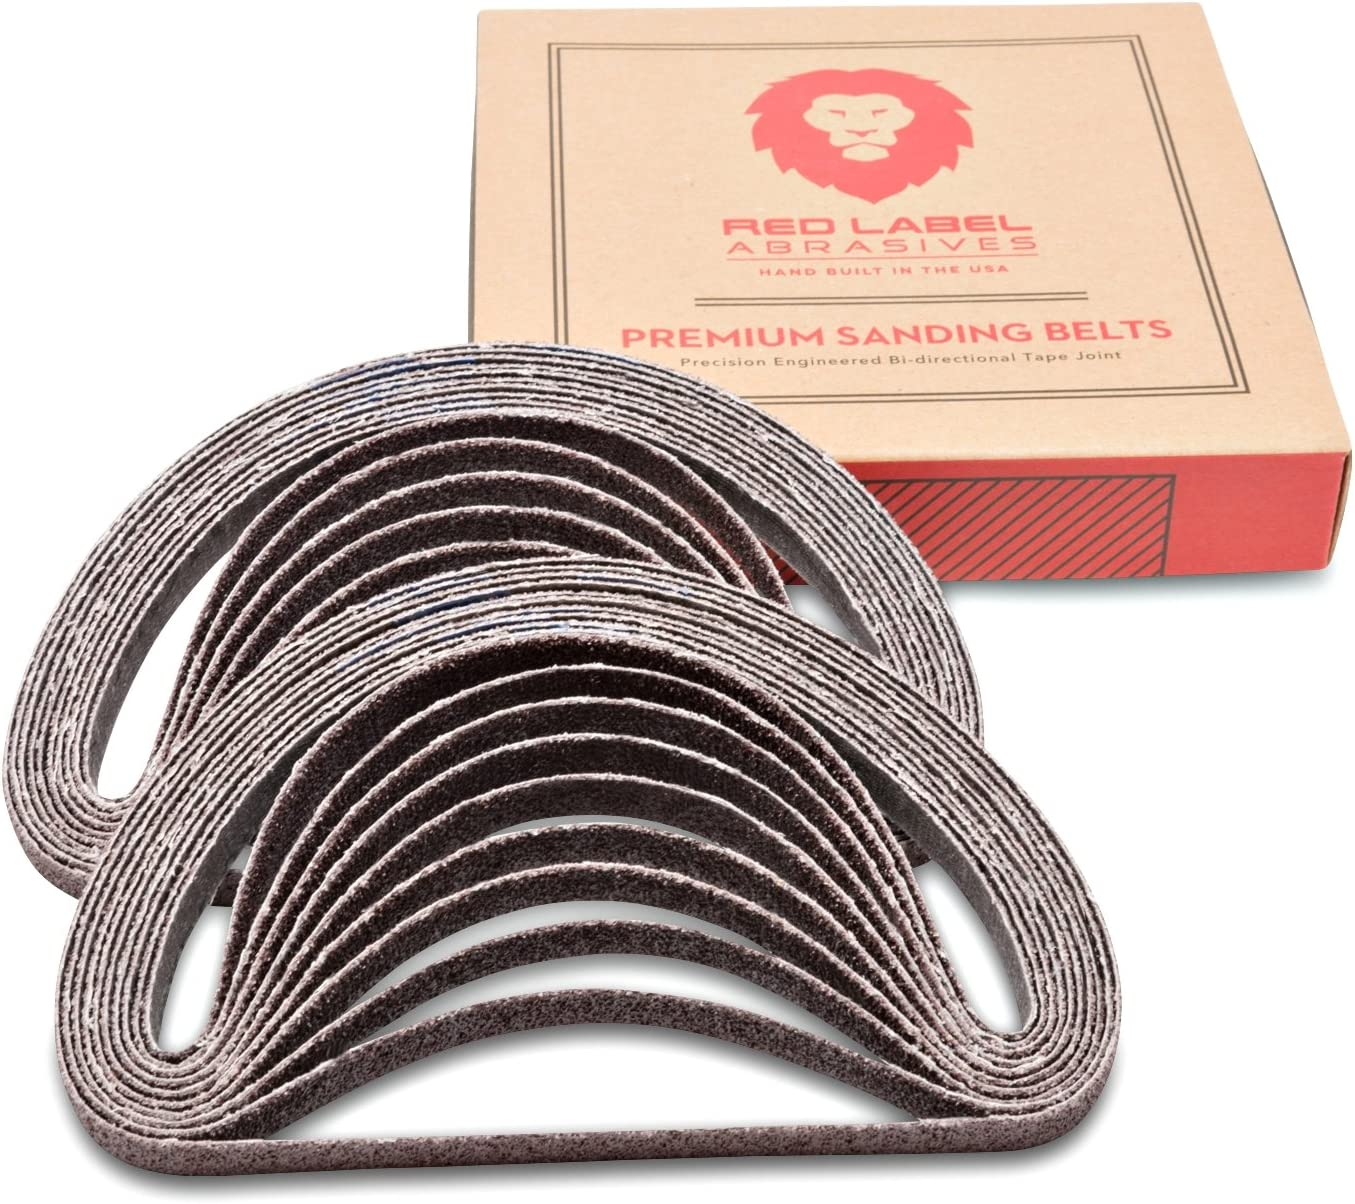 1//2 X 24 Inch 60 Grit Aluminum Oxide Air File Sanding Belts 20 Pack